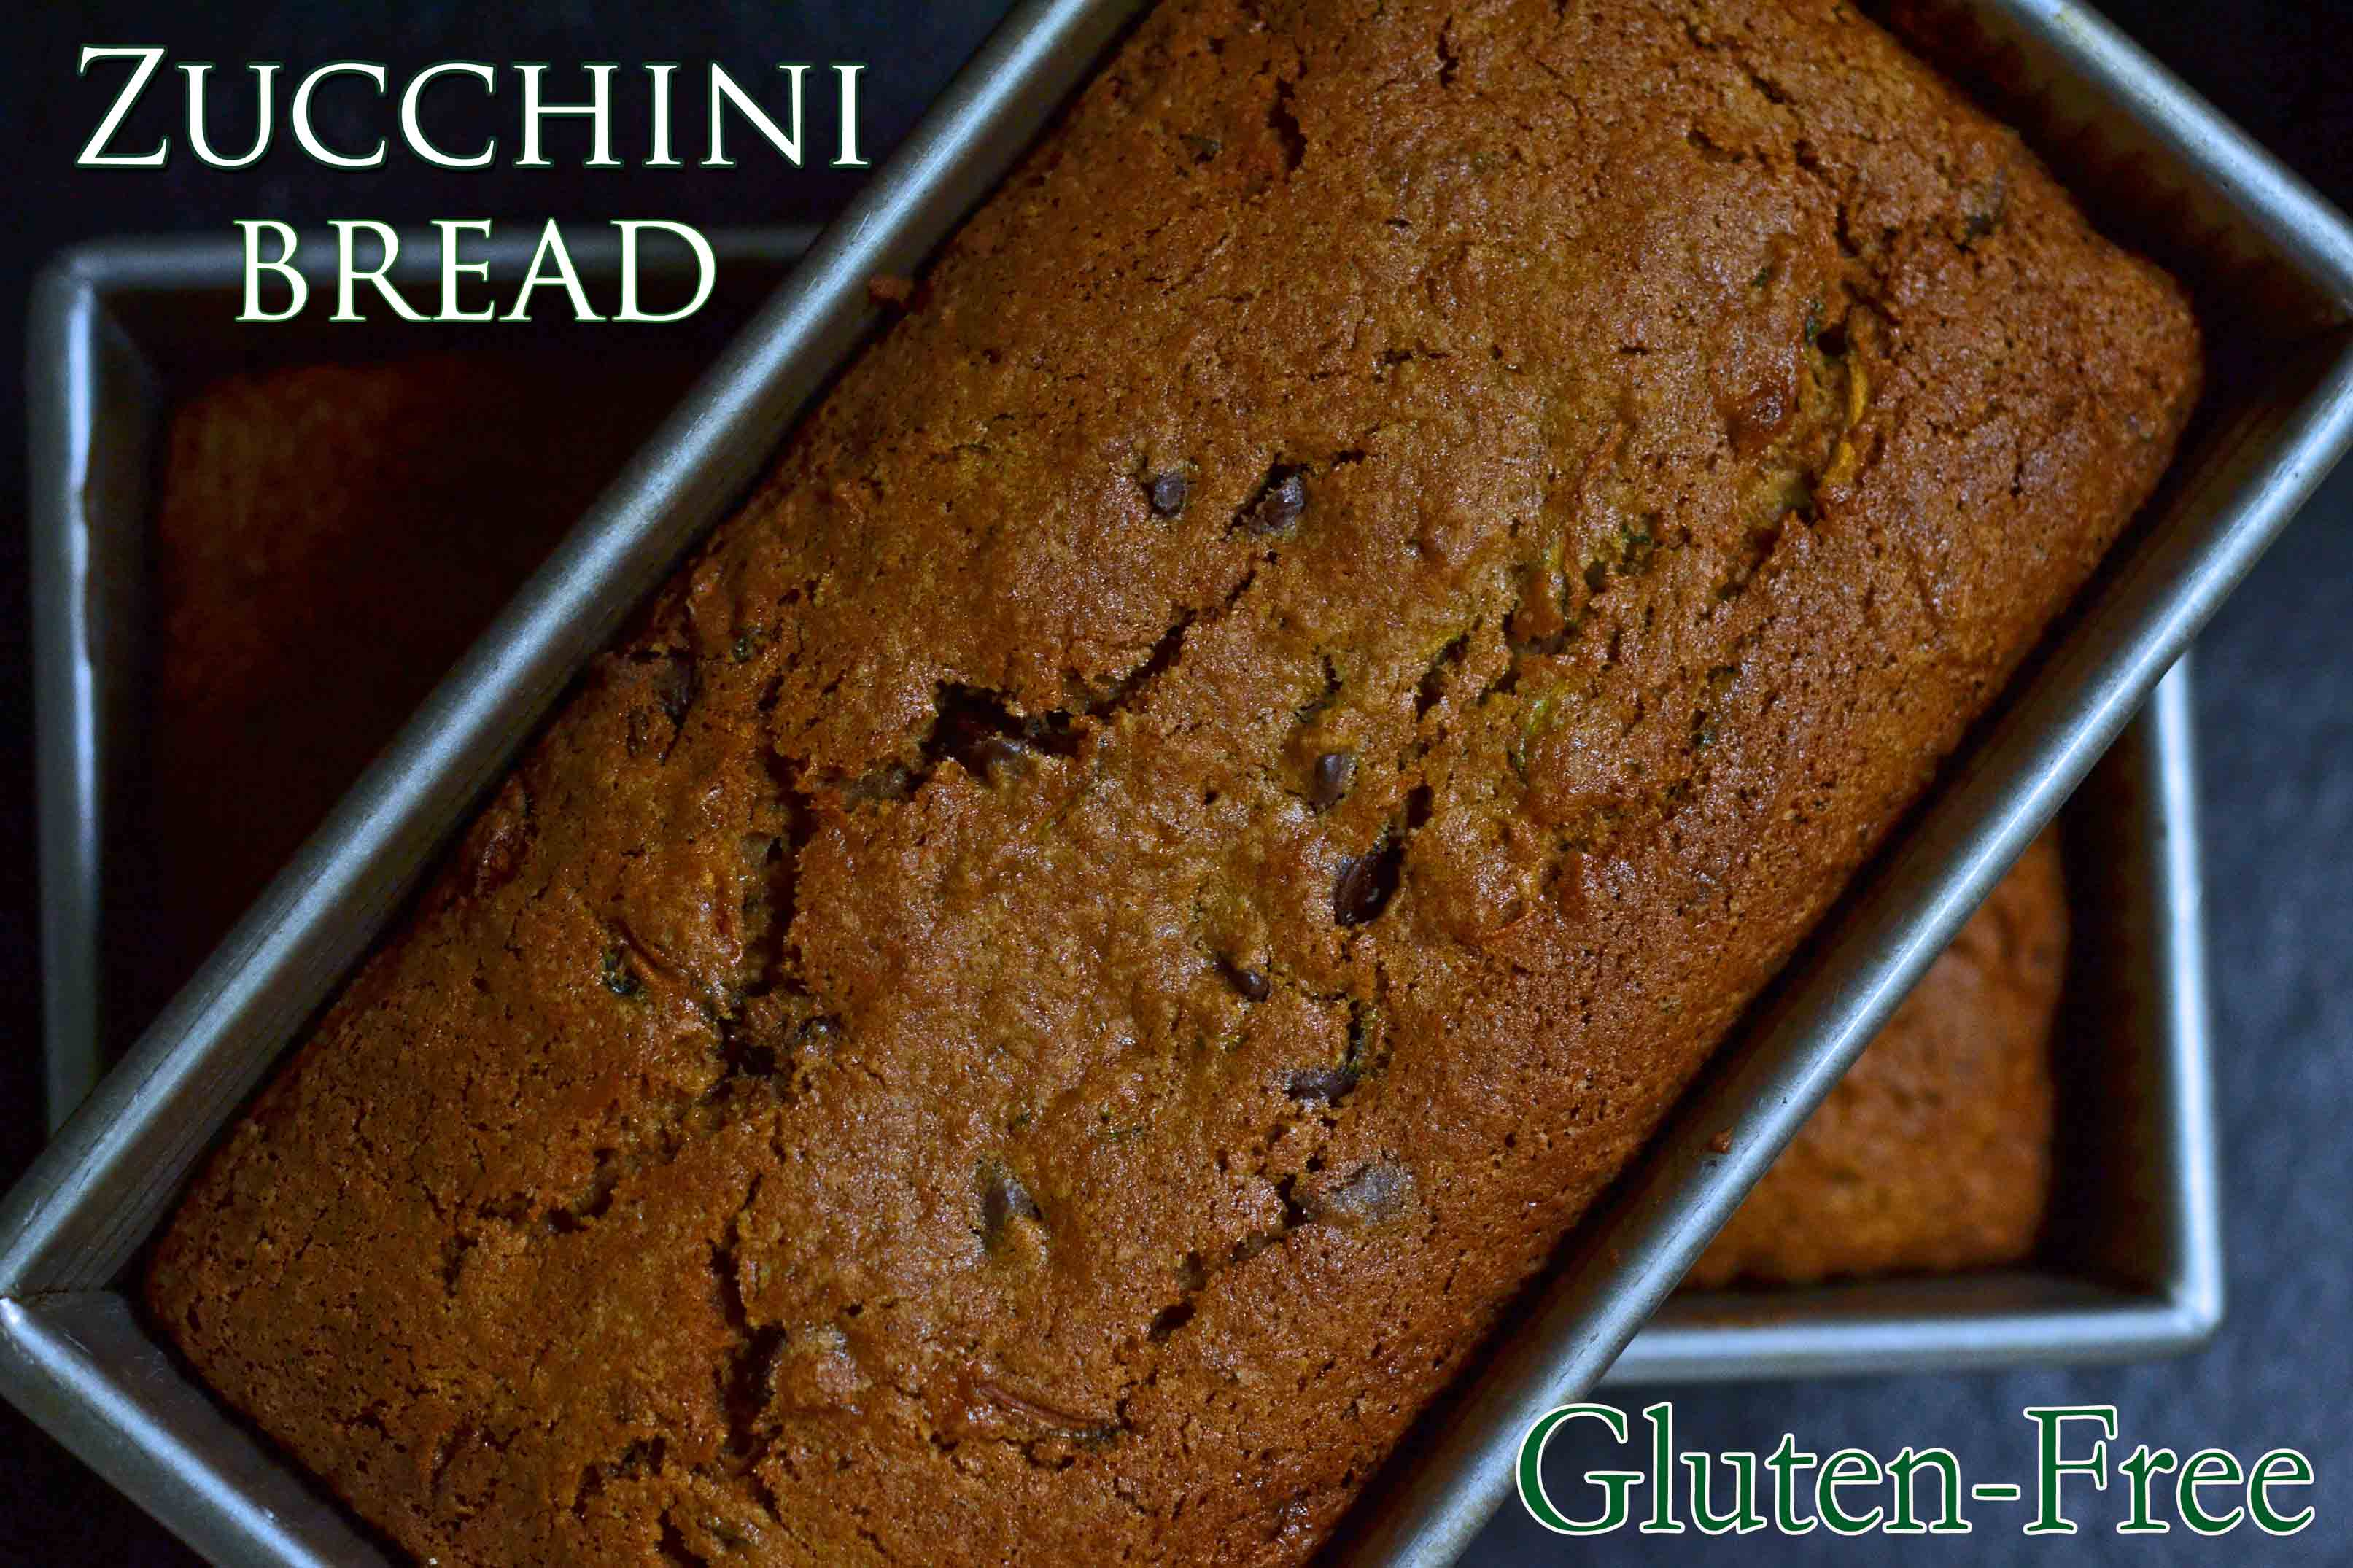 Gluten Free Zucchini Bread | Gluten-Free on a Shoestring